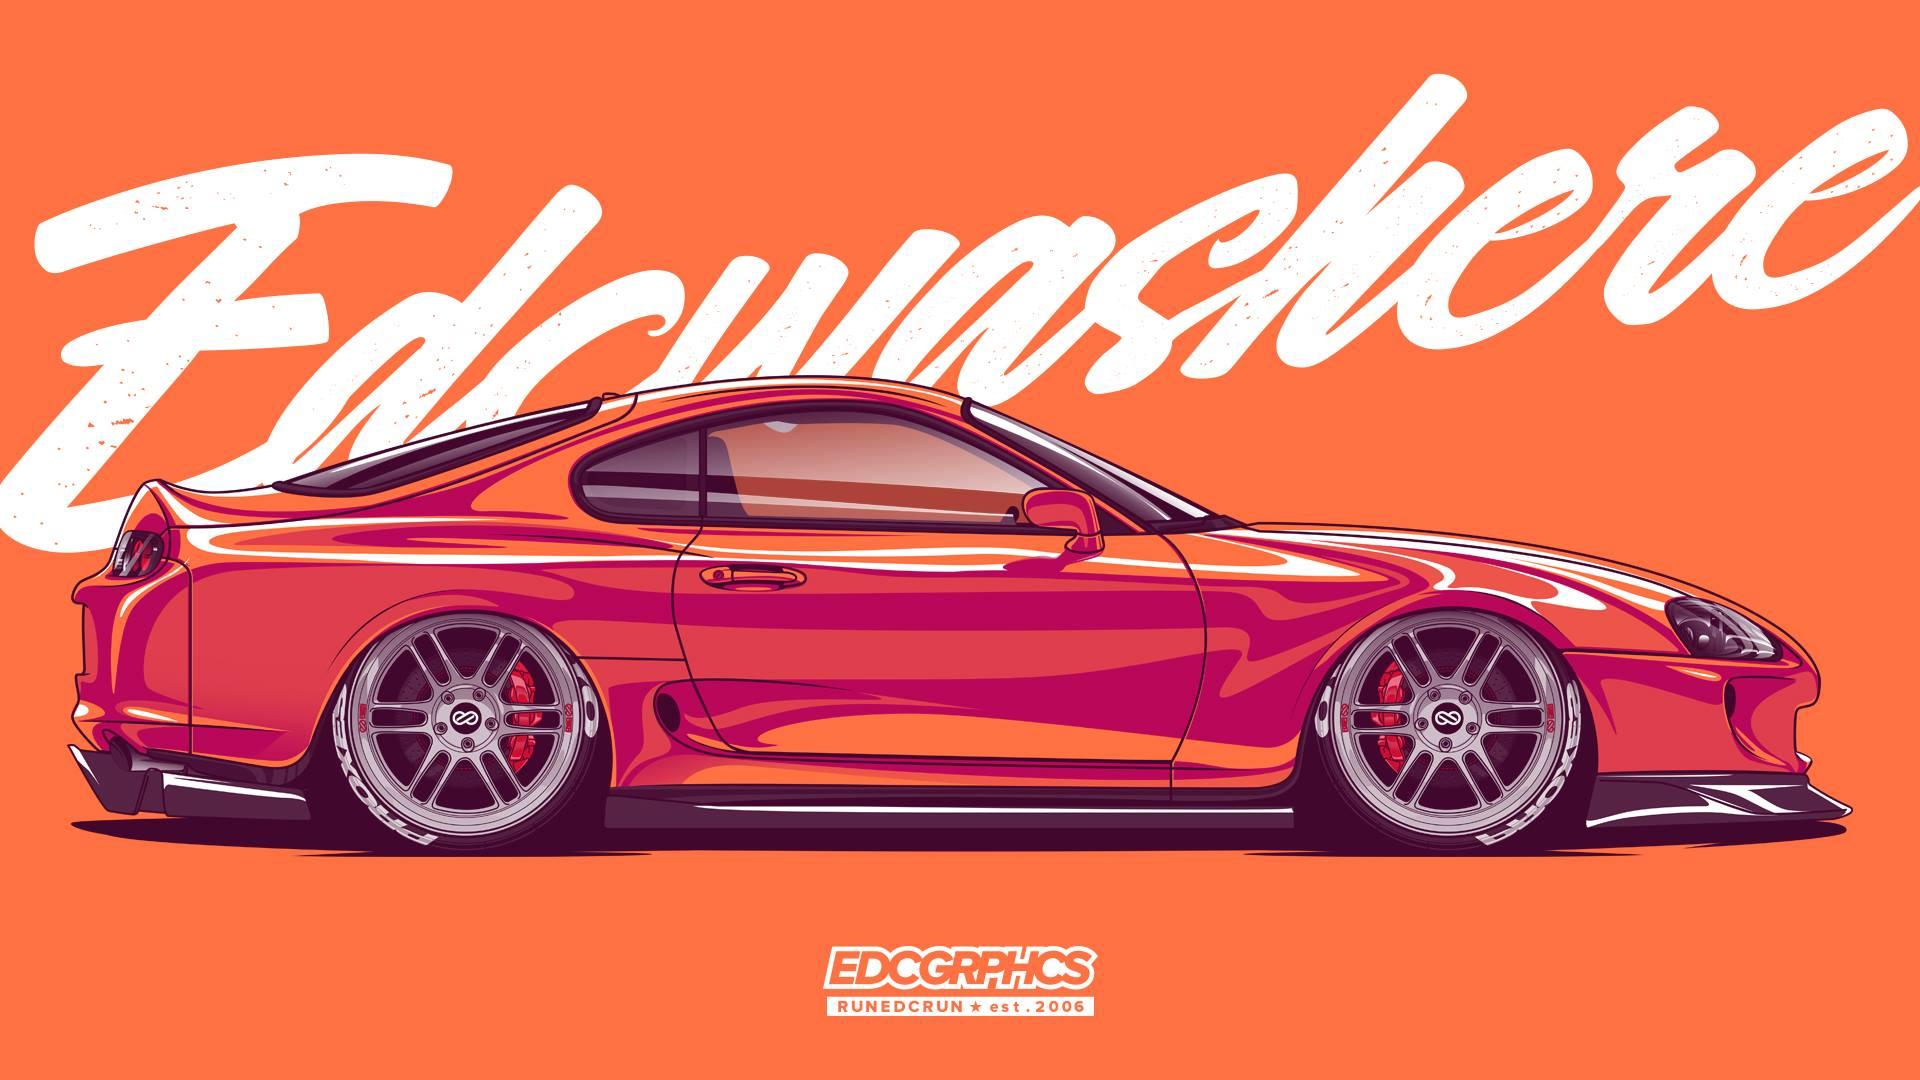 Wallpaper : EDC Graphics, Toyota Supra, JDM, Japanese cars ...